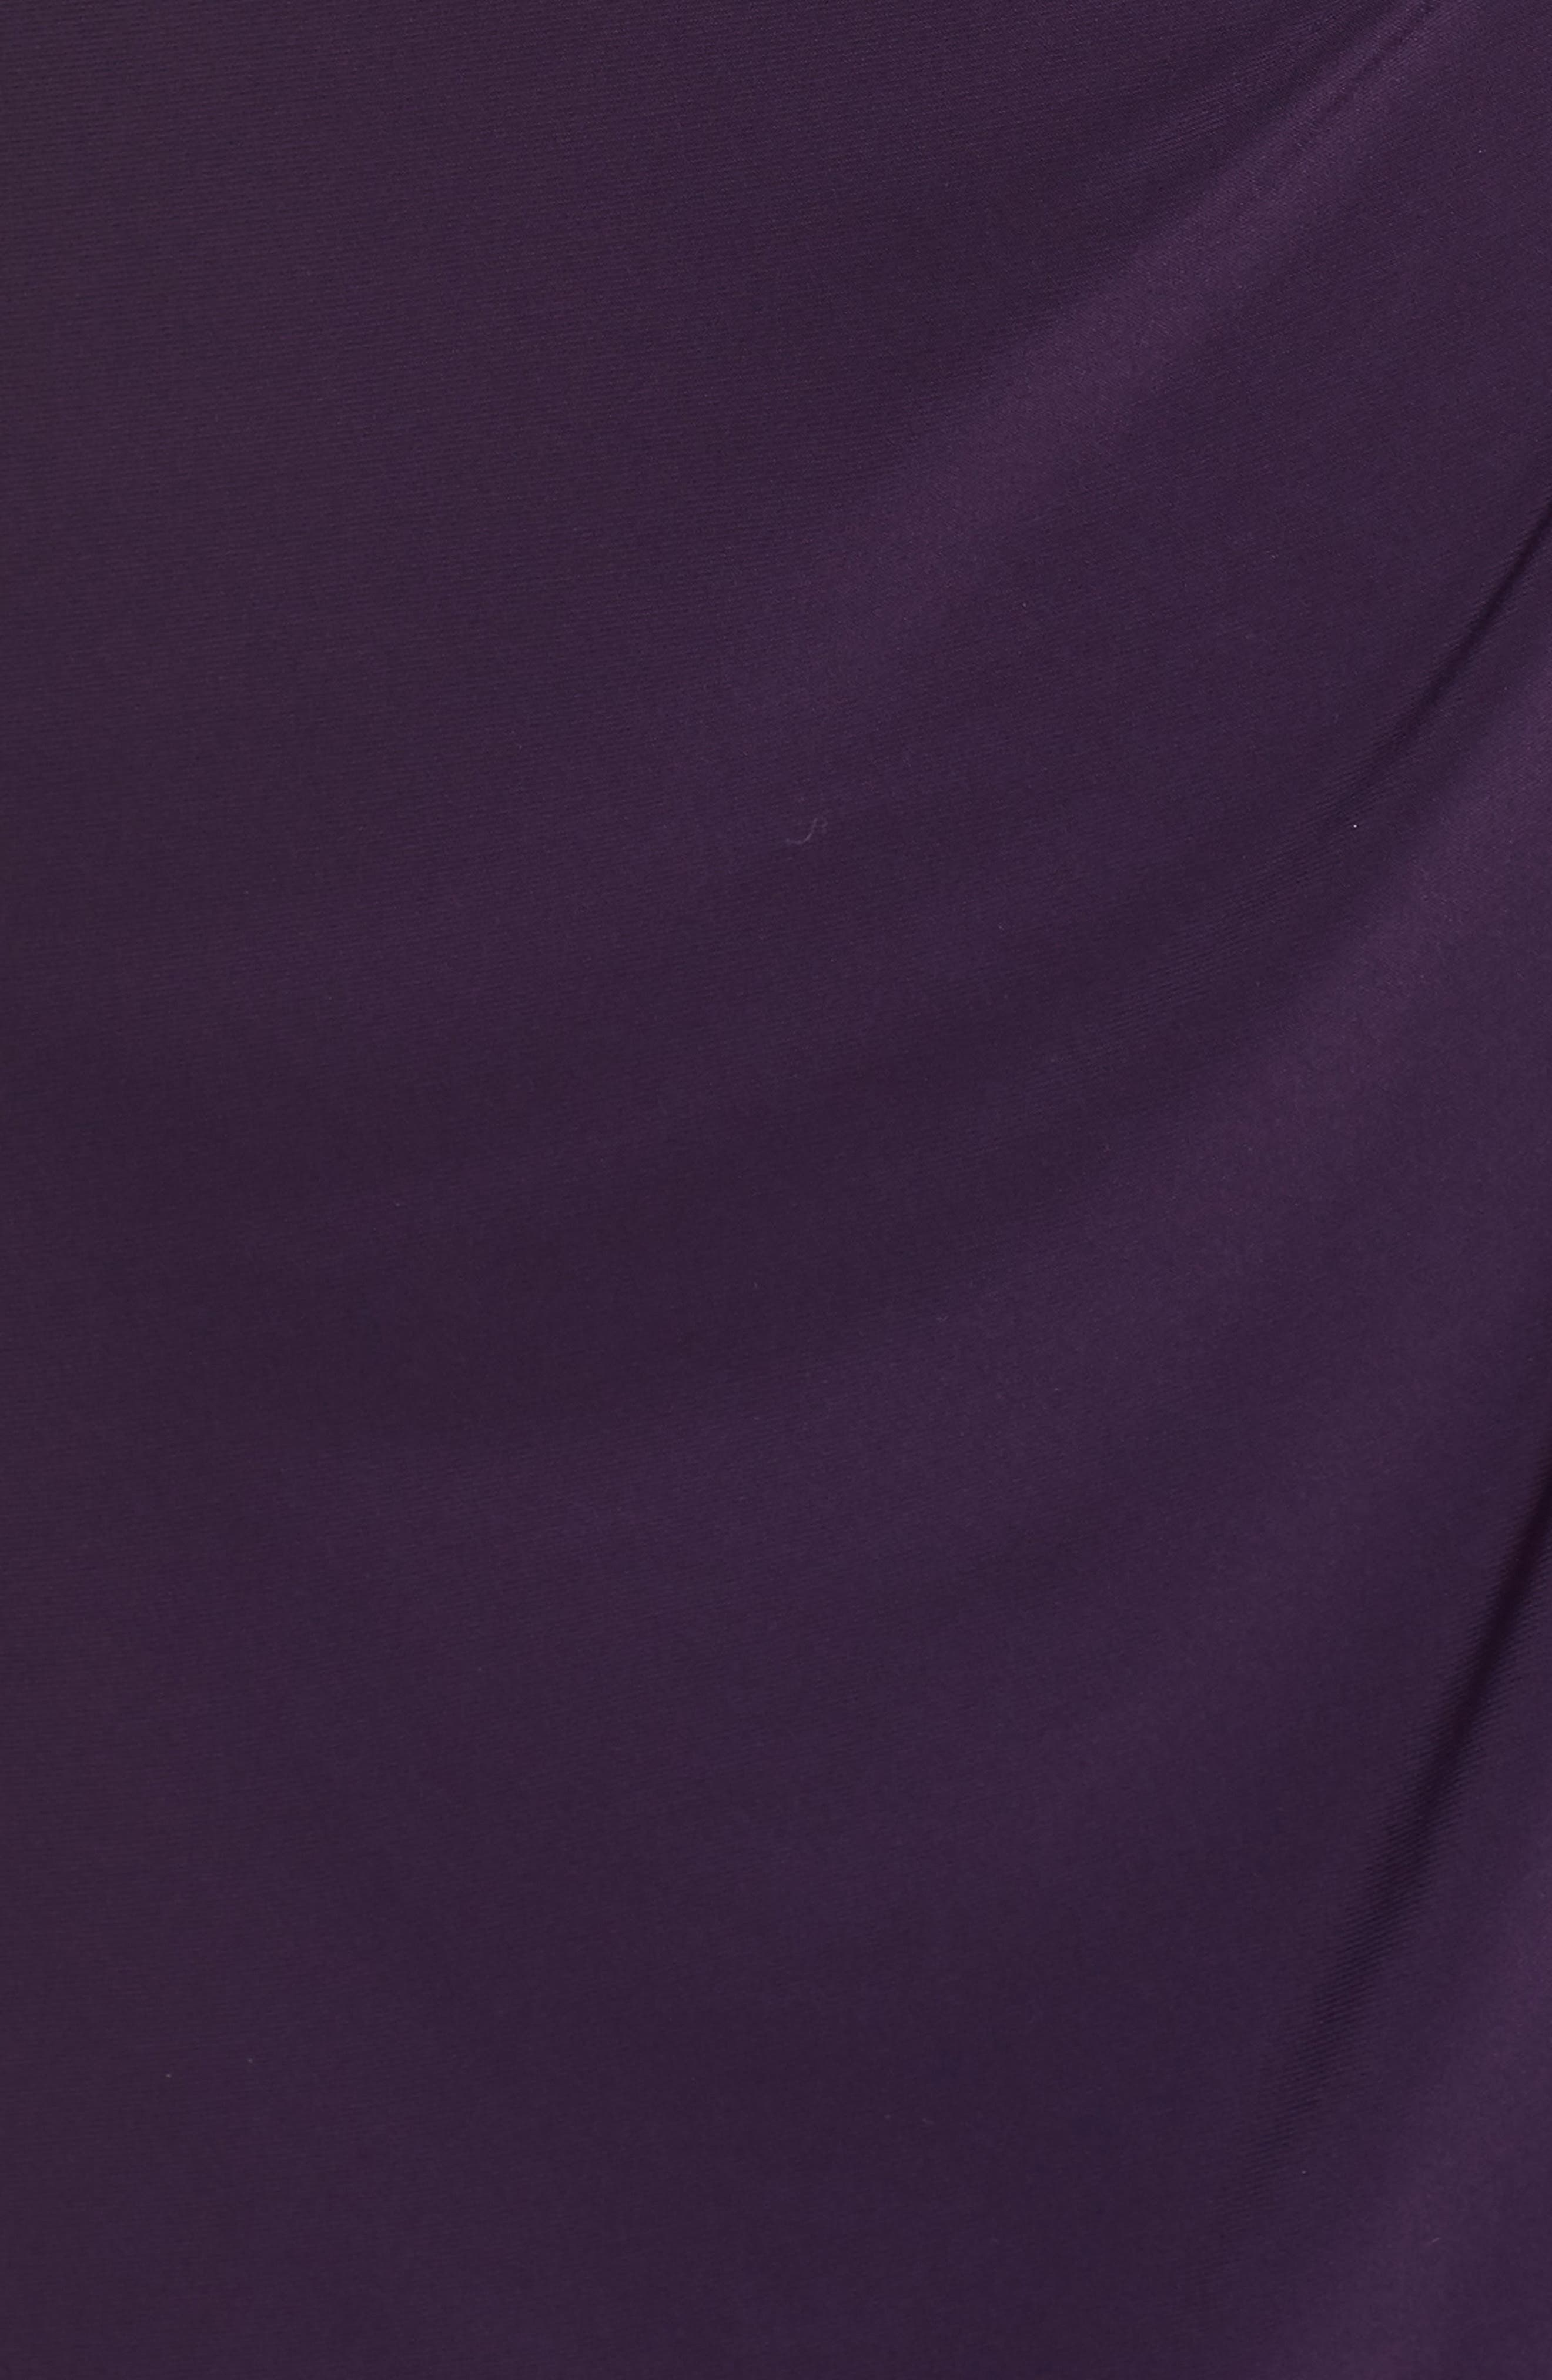 Embellished Ruffle Detail Shift Dress,                             Alternate thumbnail 6, color,                             Eggplant